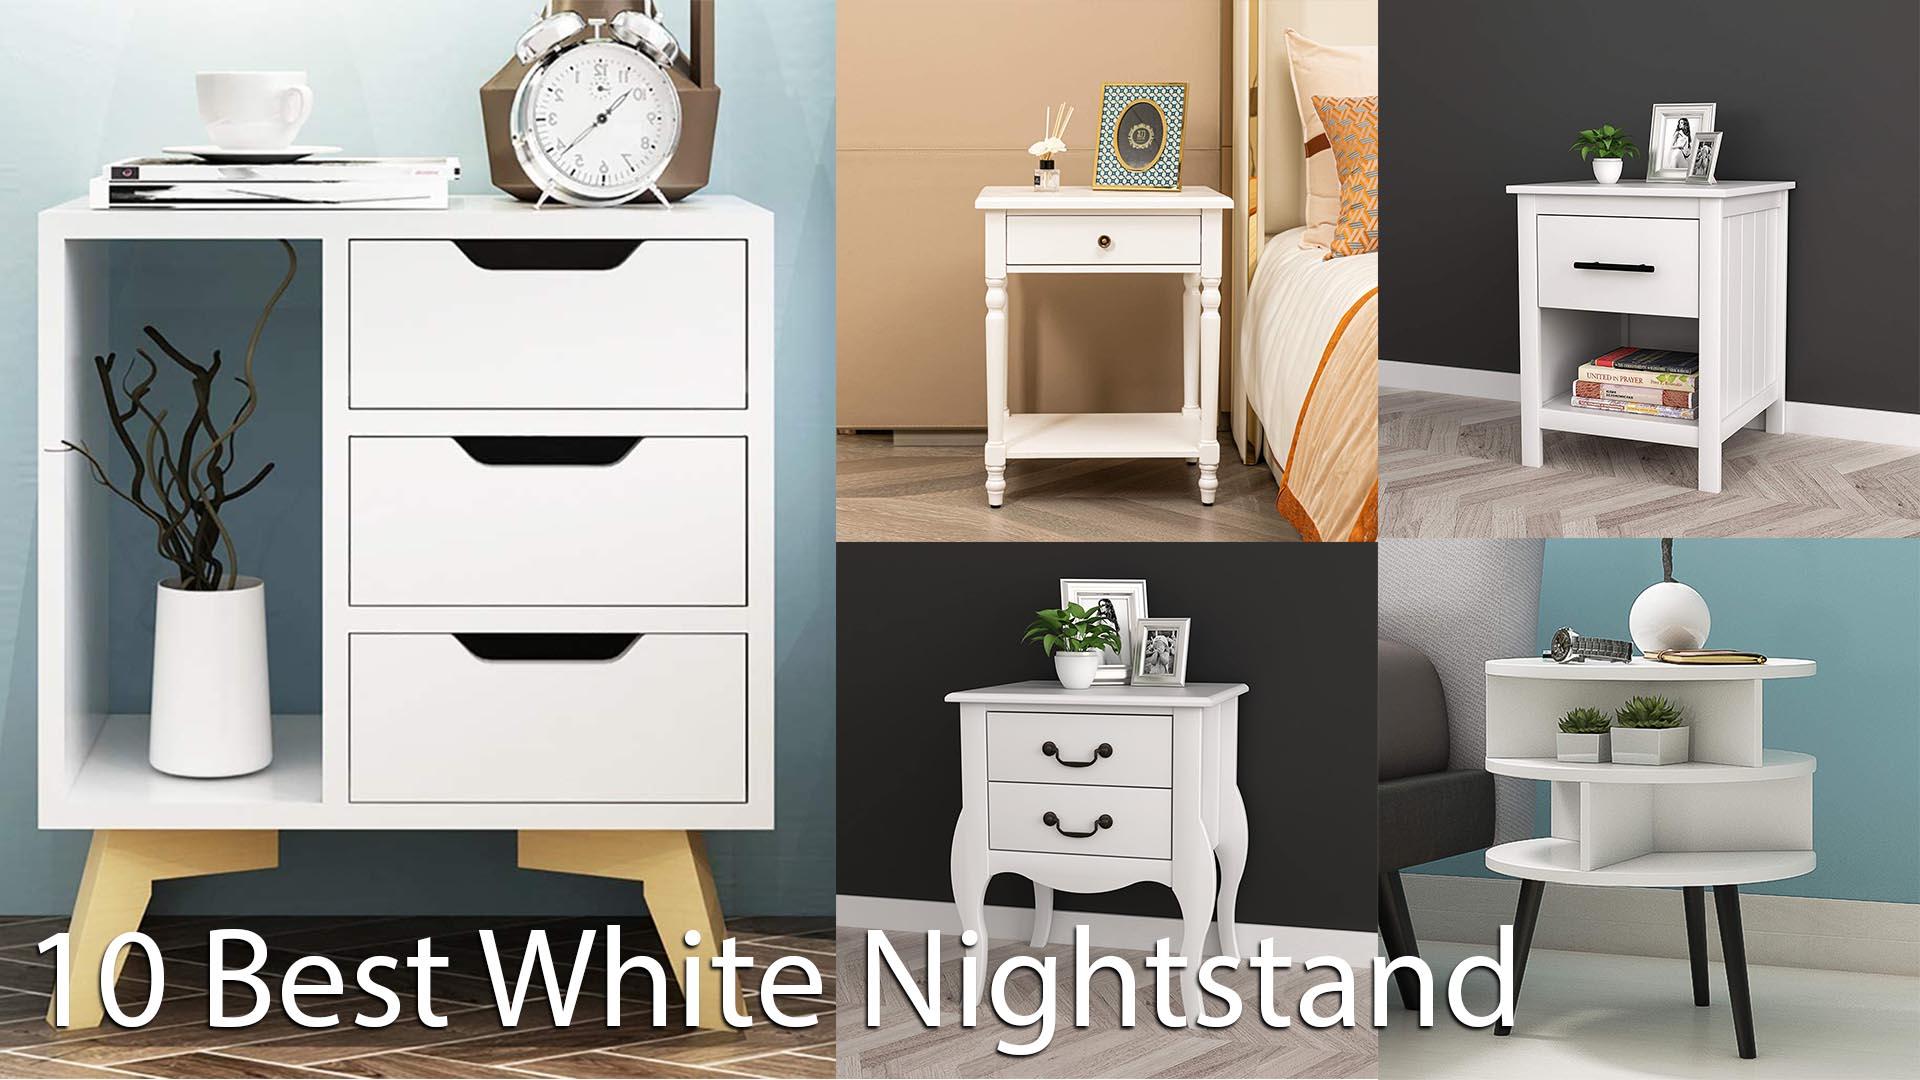 Top Best White Nightstand  for Your Bedroom Décor